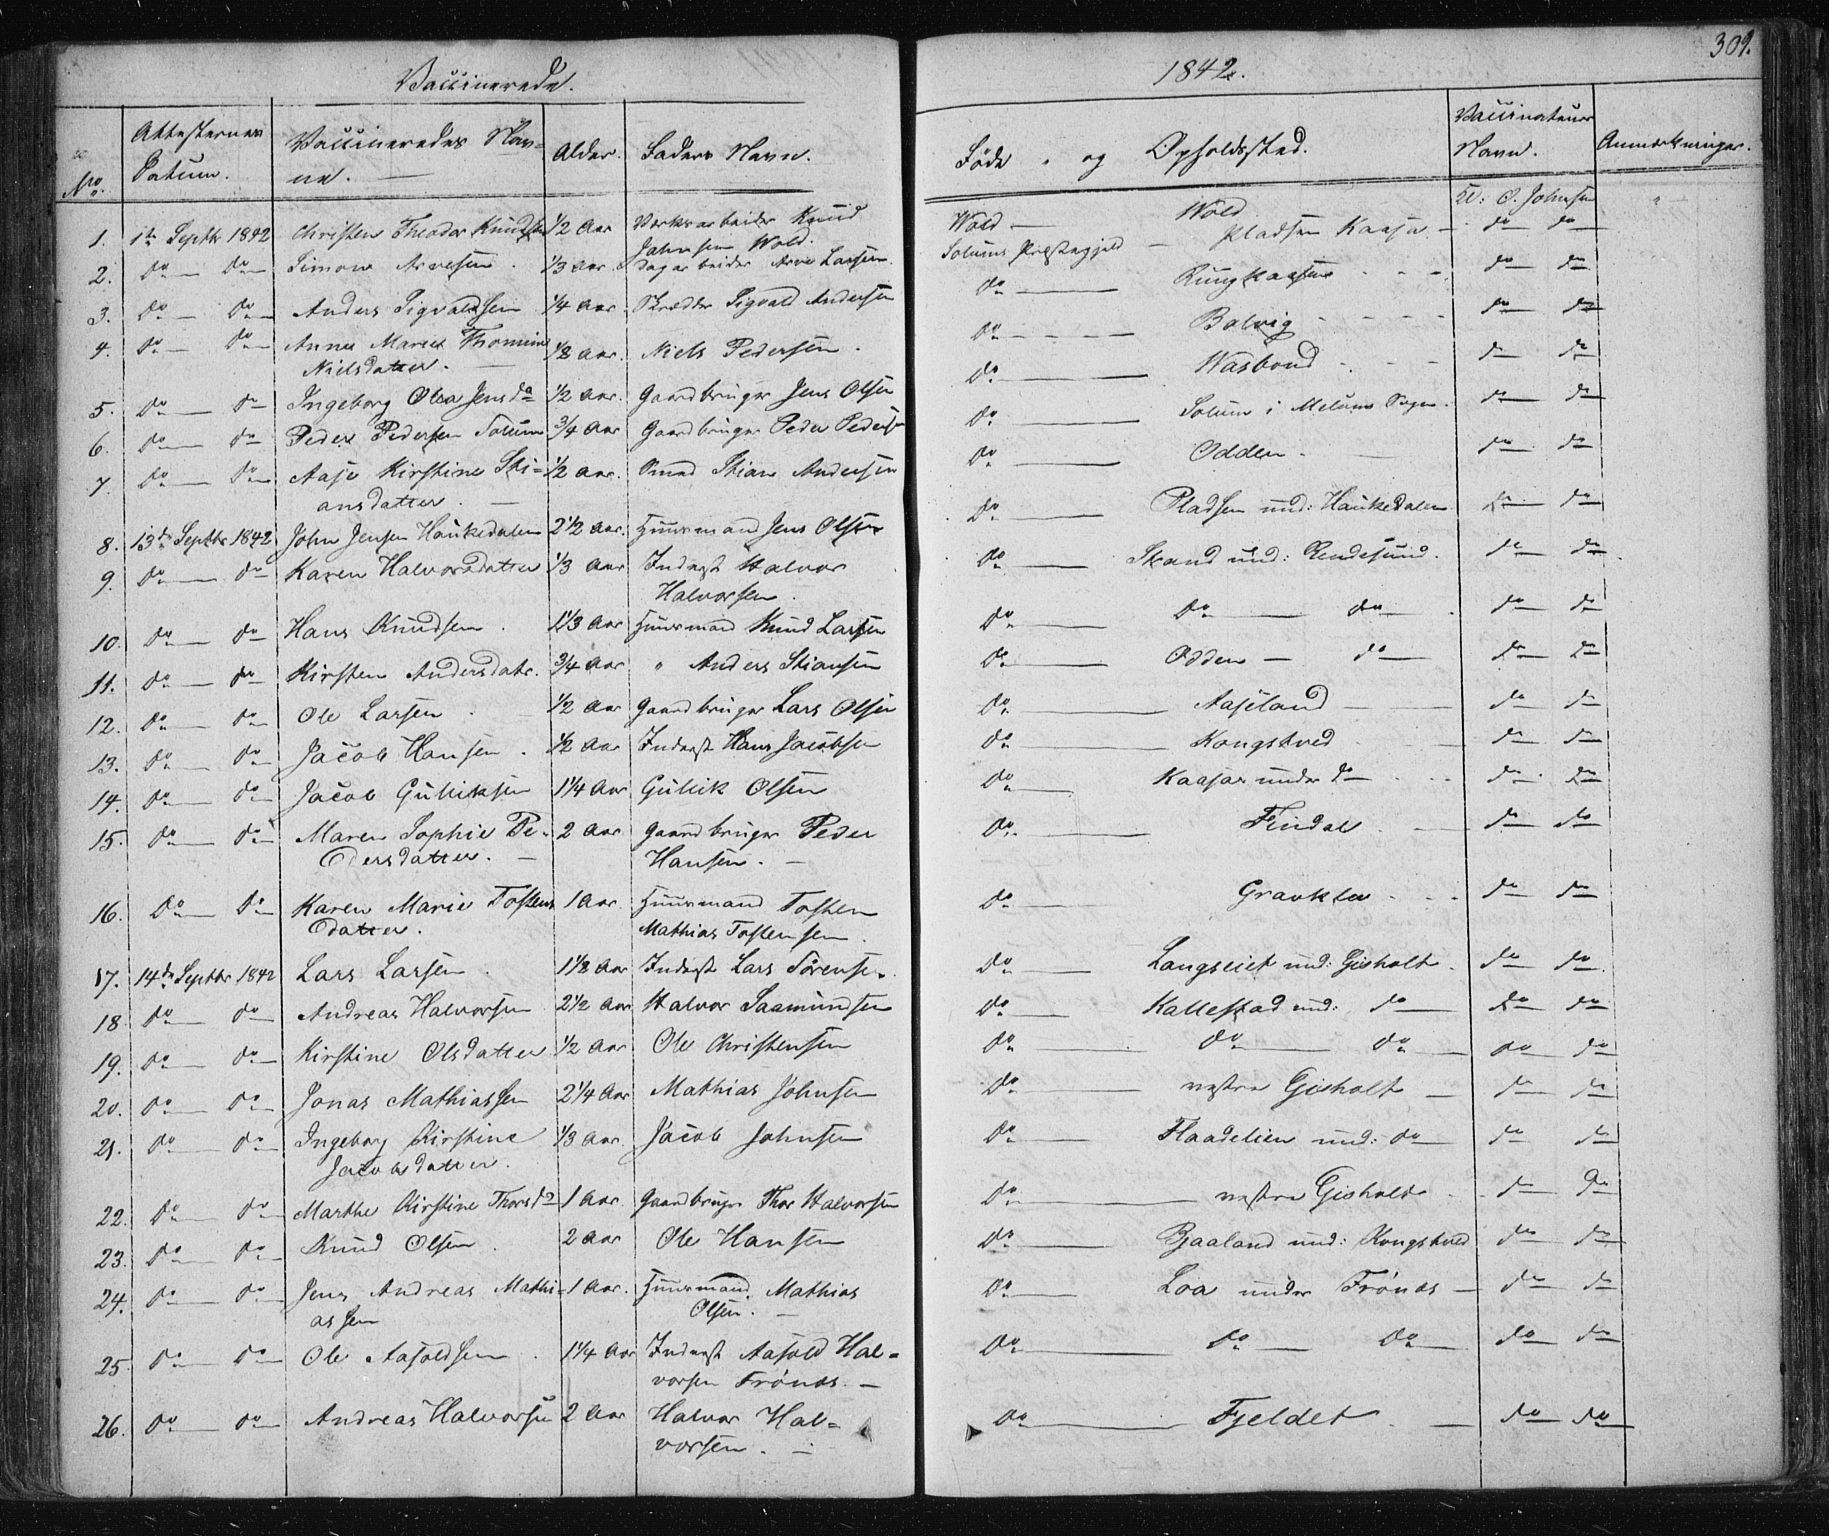 SAKO, Solum kirkebøker, F/Fa/L0005: Ministerialbok nr. I 5, 1833-1843, s. 309